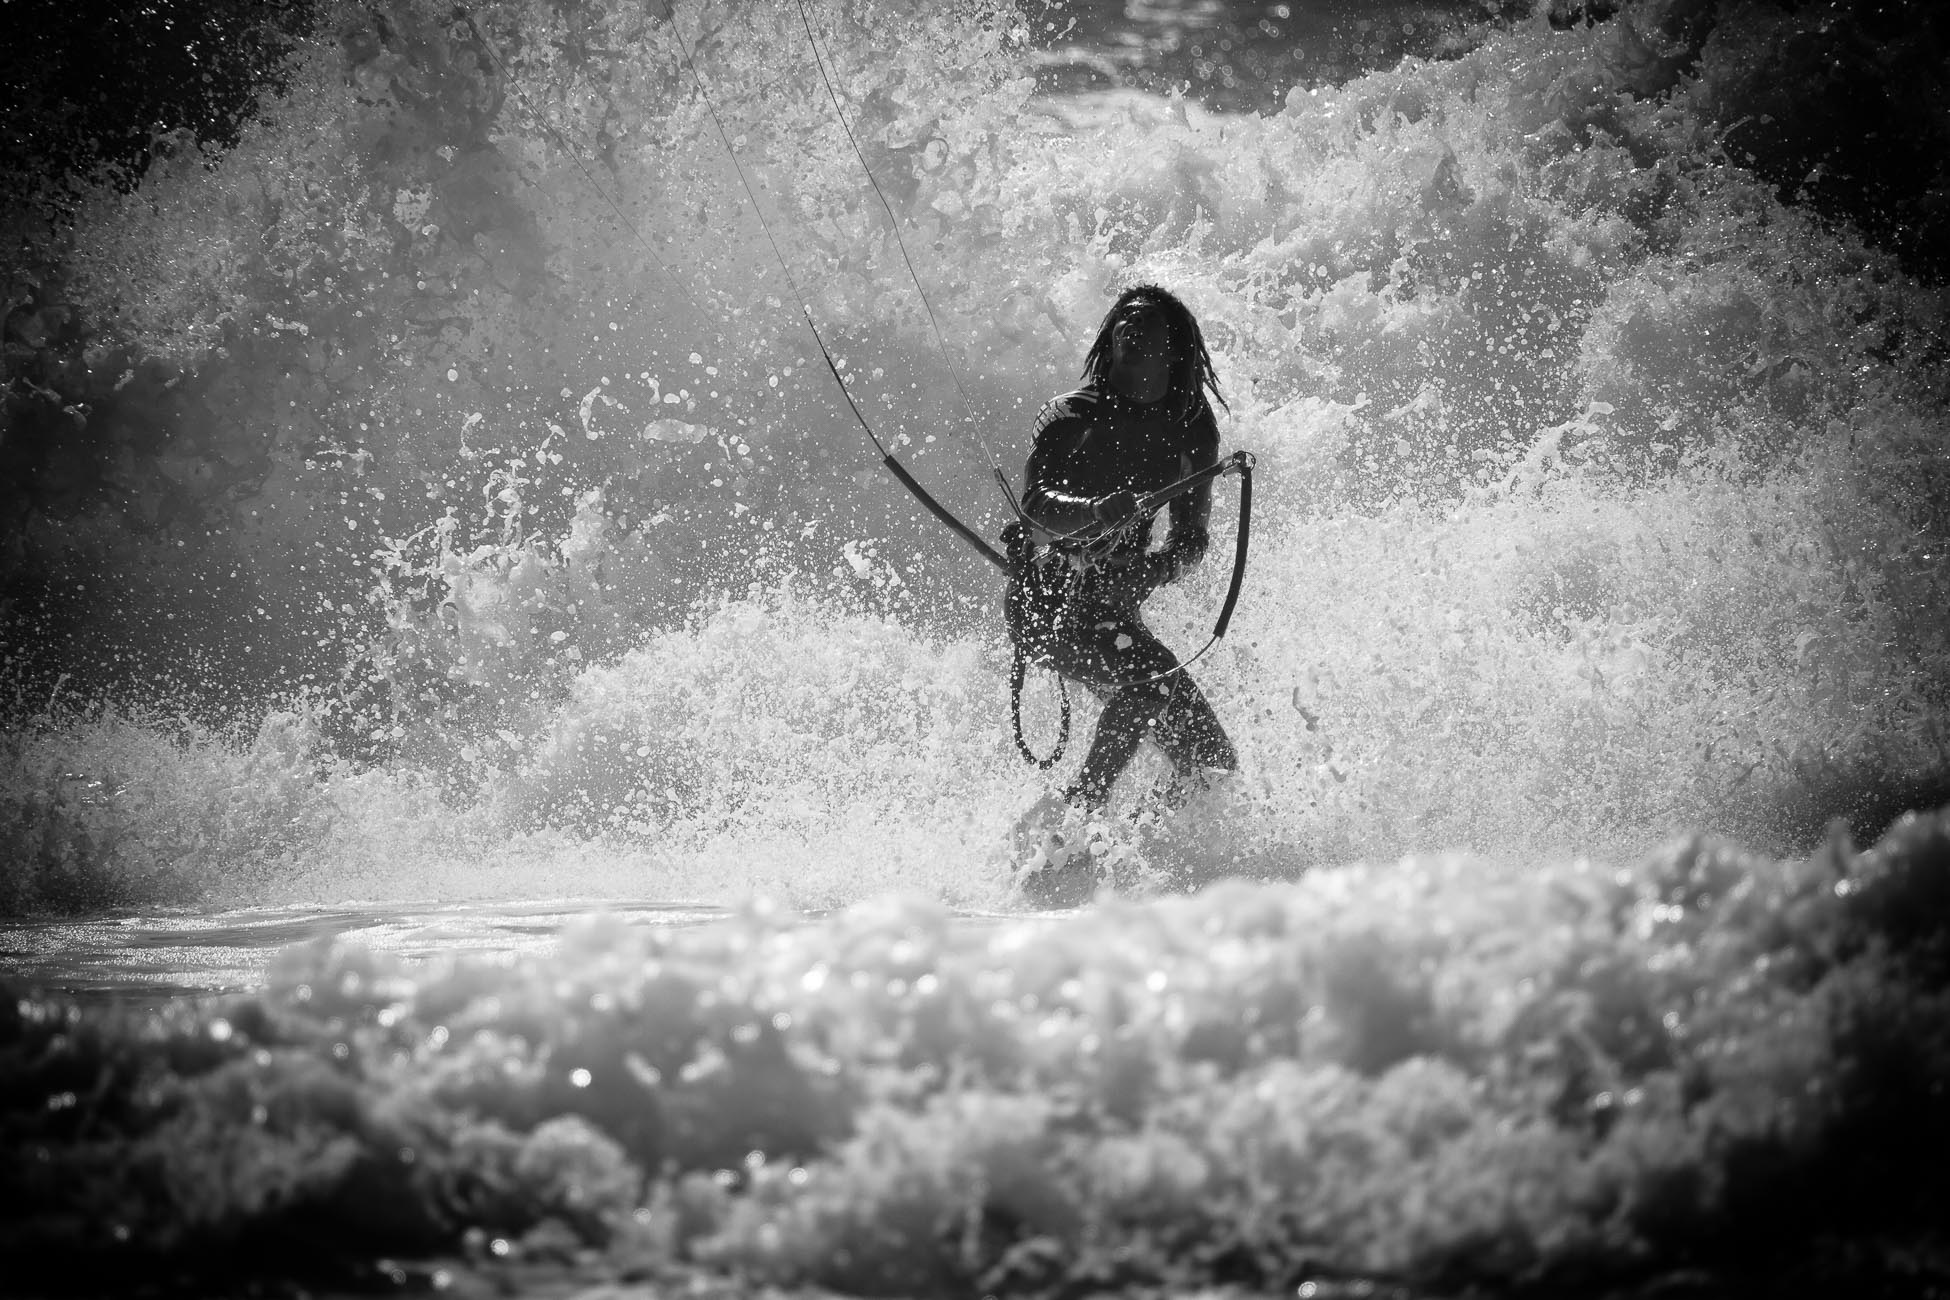 Gonçalo Barriga Photographer - Kitesurf action